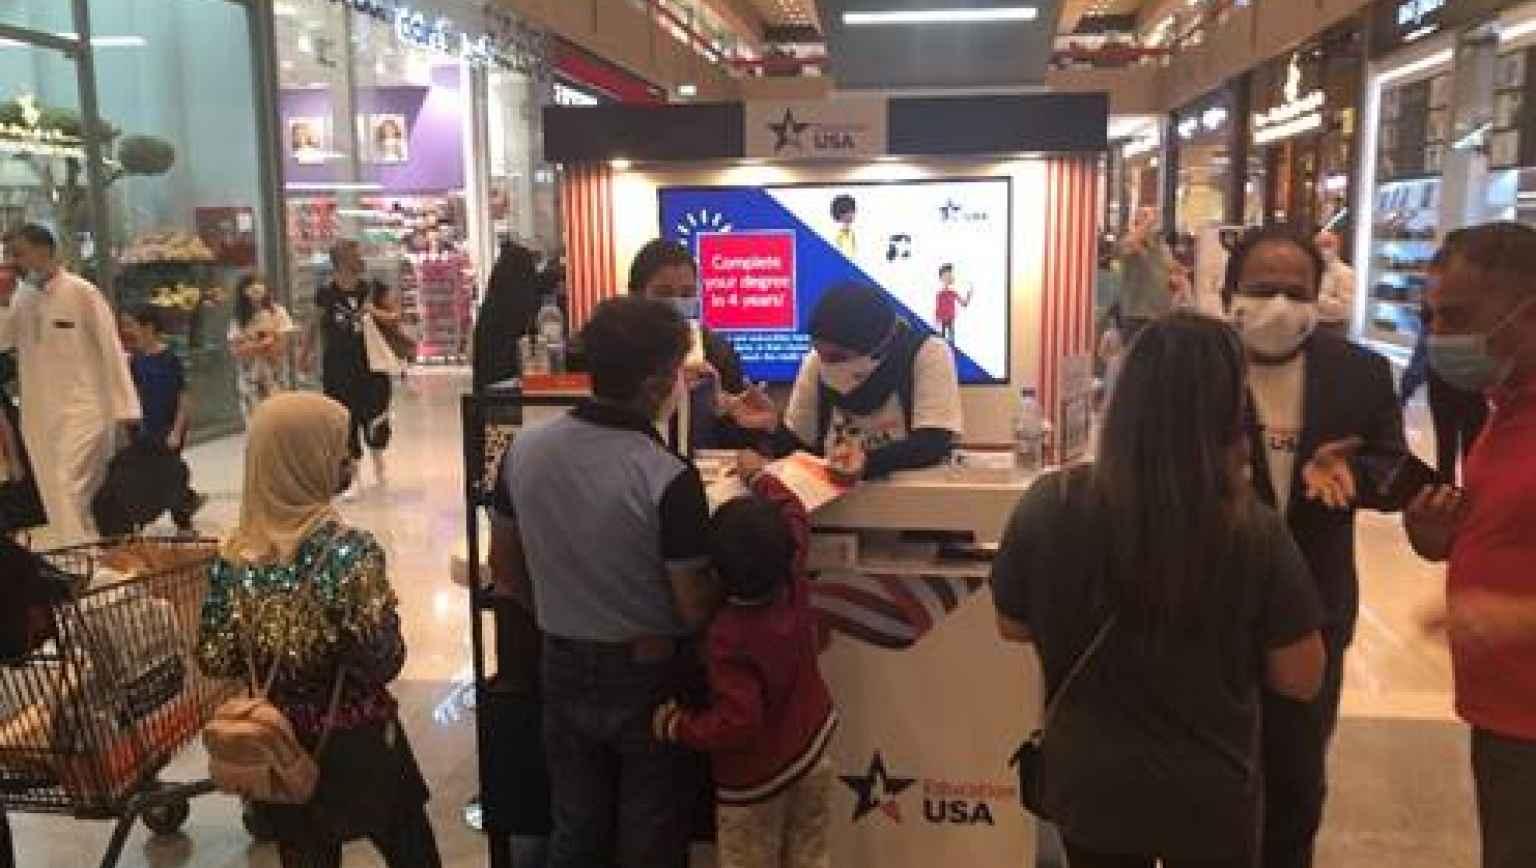 EducationUSA staff speak with visitors at its Kiosk at Doha Festival City Mall